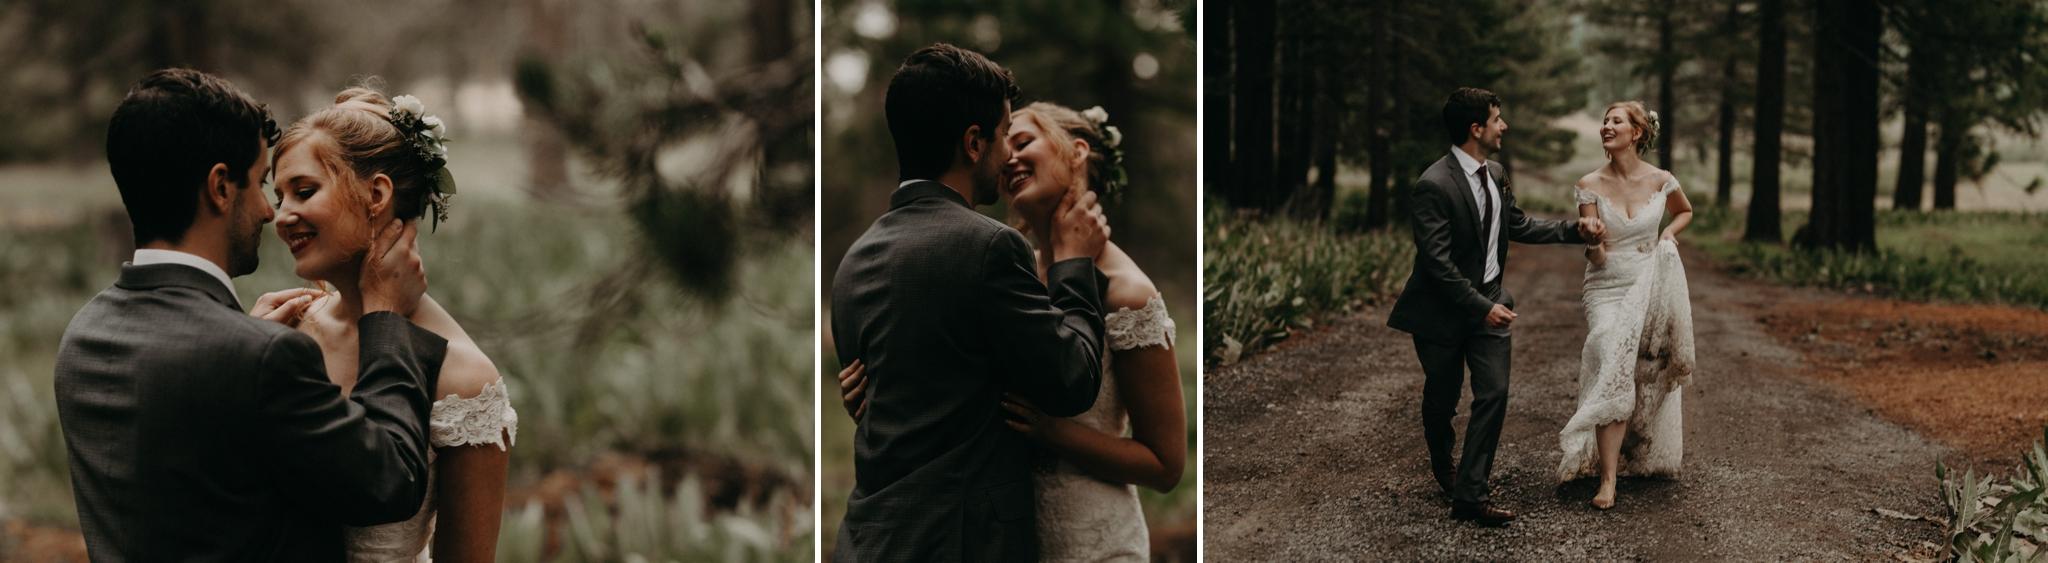 tahoe-wedding-photographer6.jpg